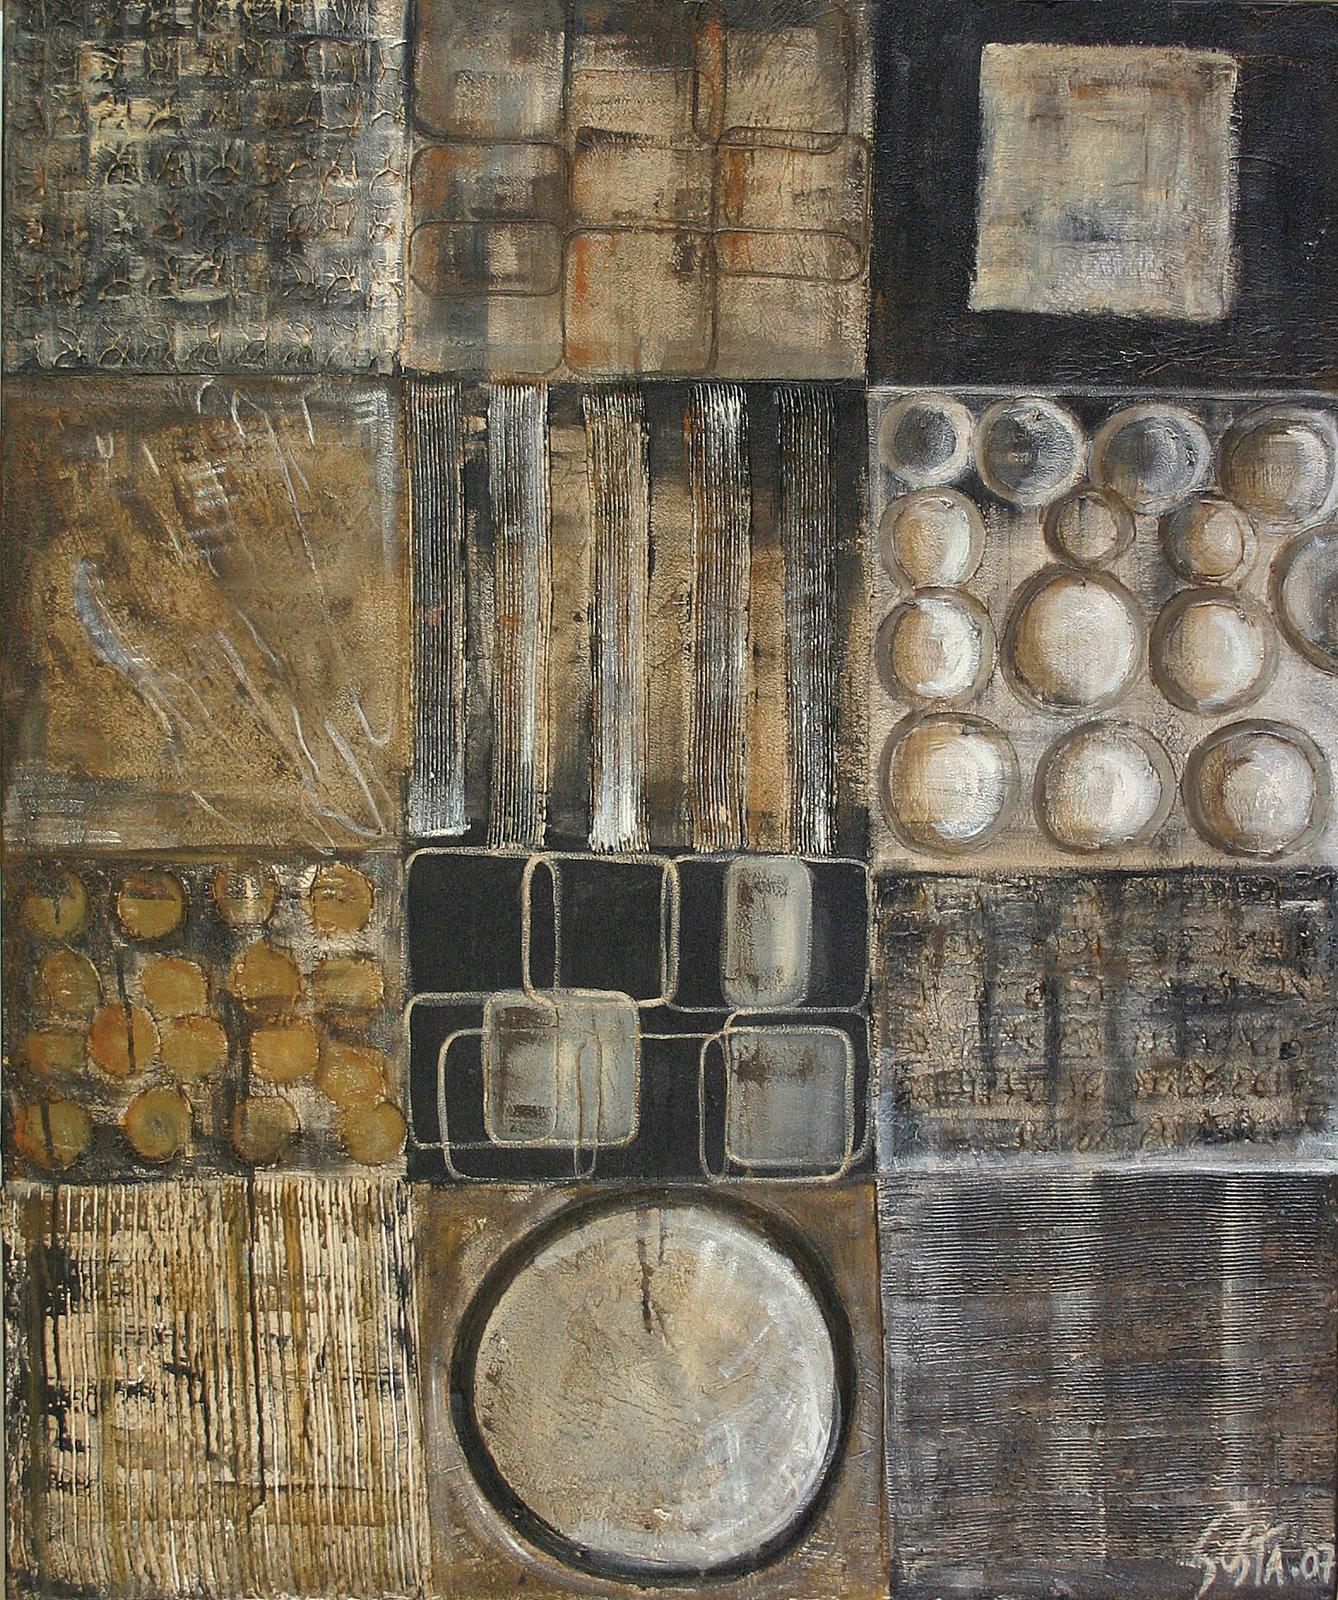 Tableau Contemporain, Zapping. Sophie Costa, artiste peintre.